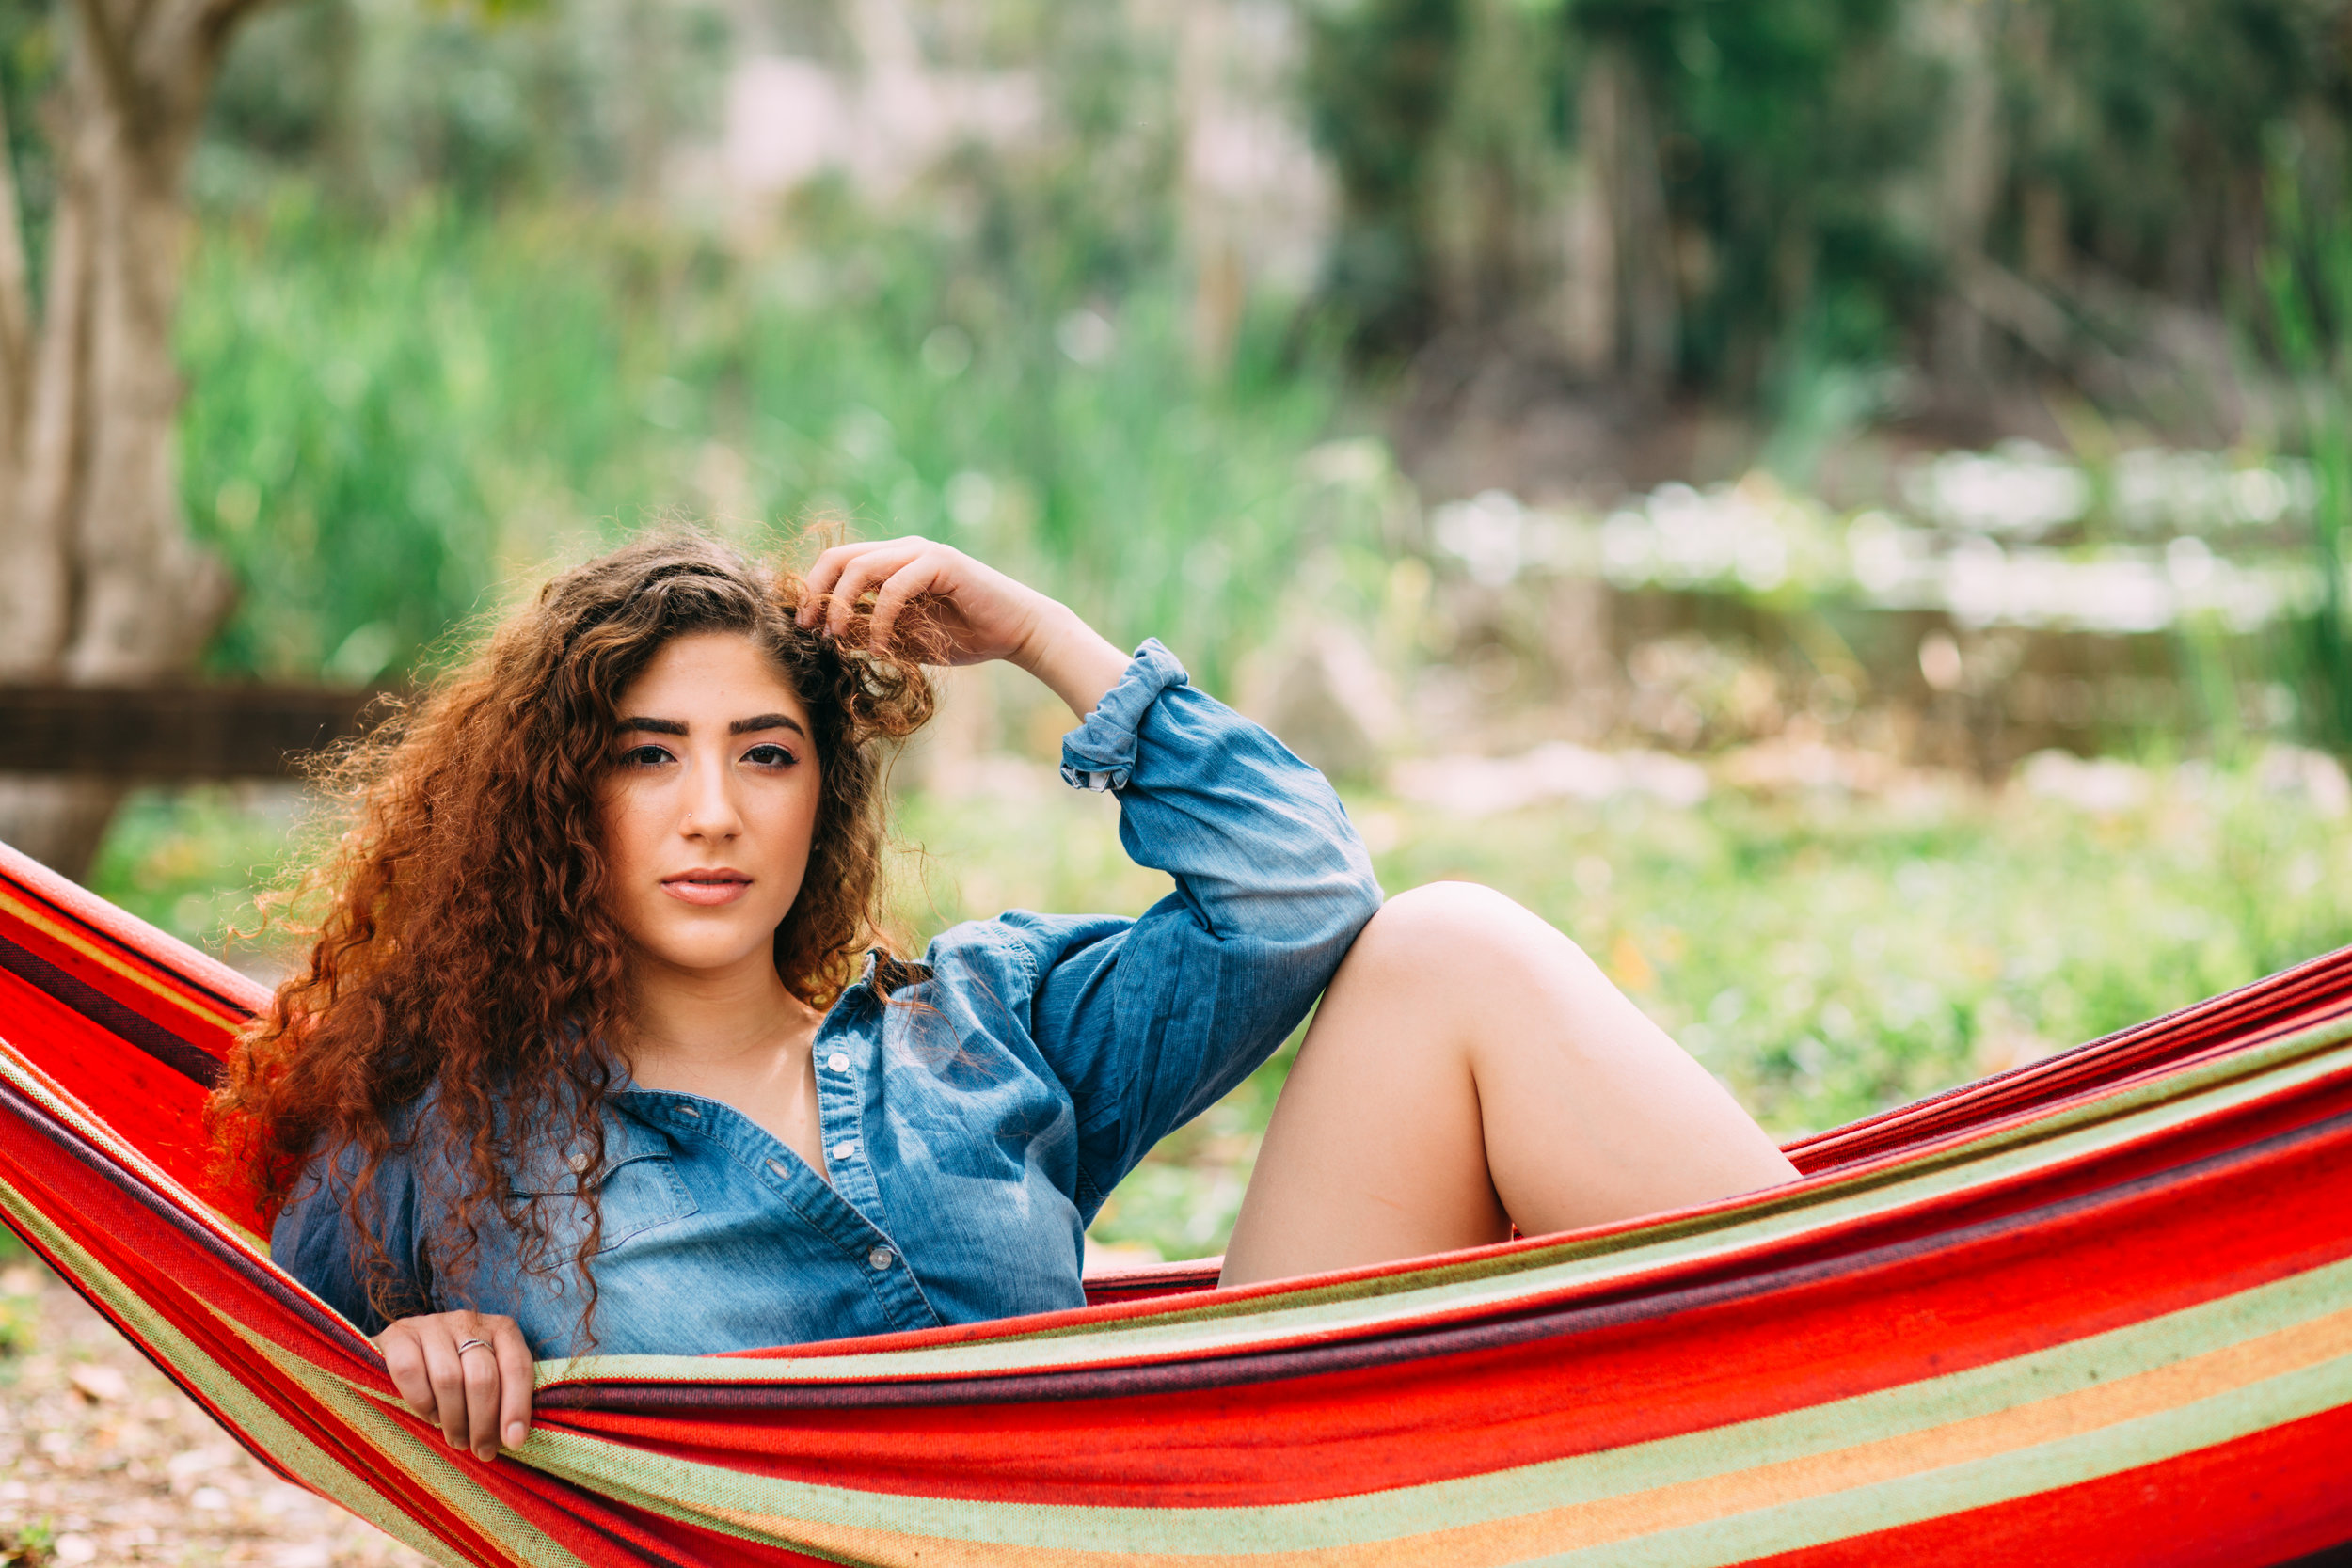 Monica Saggio by SWAY PHOTOS (15 of 15).JPG